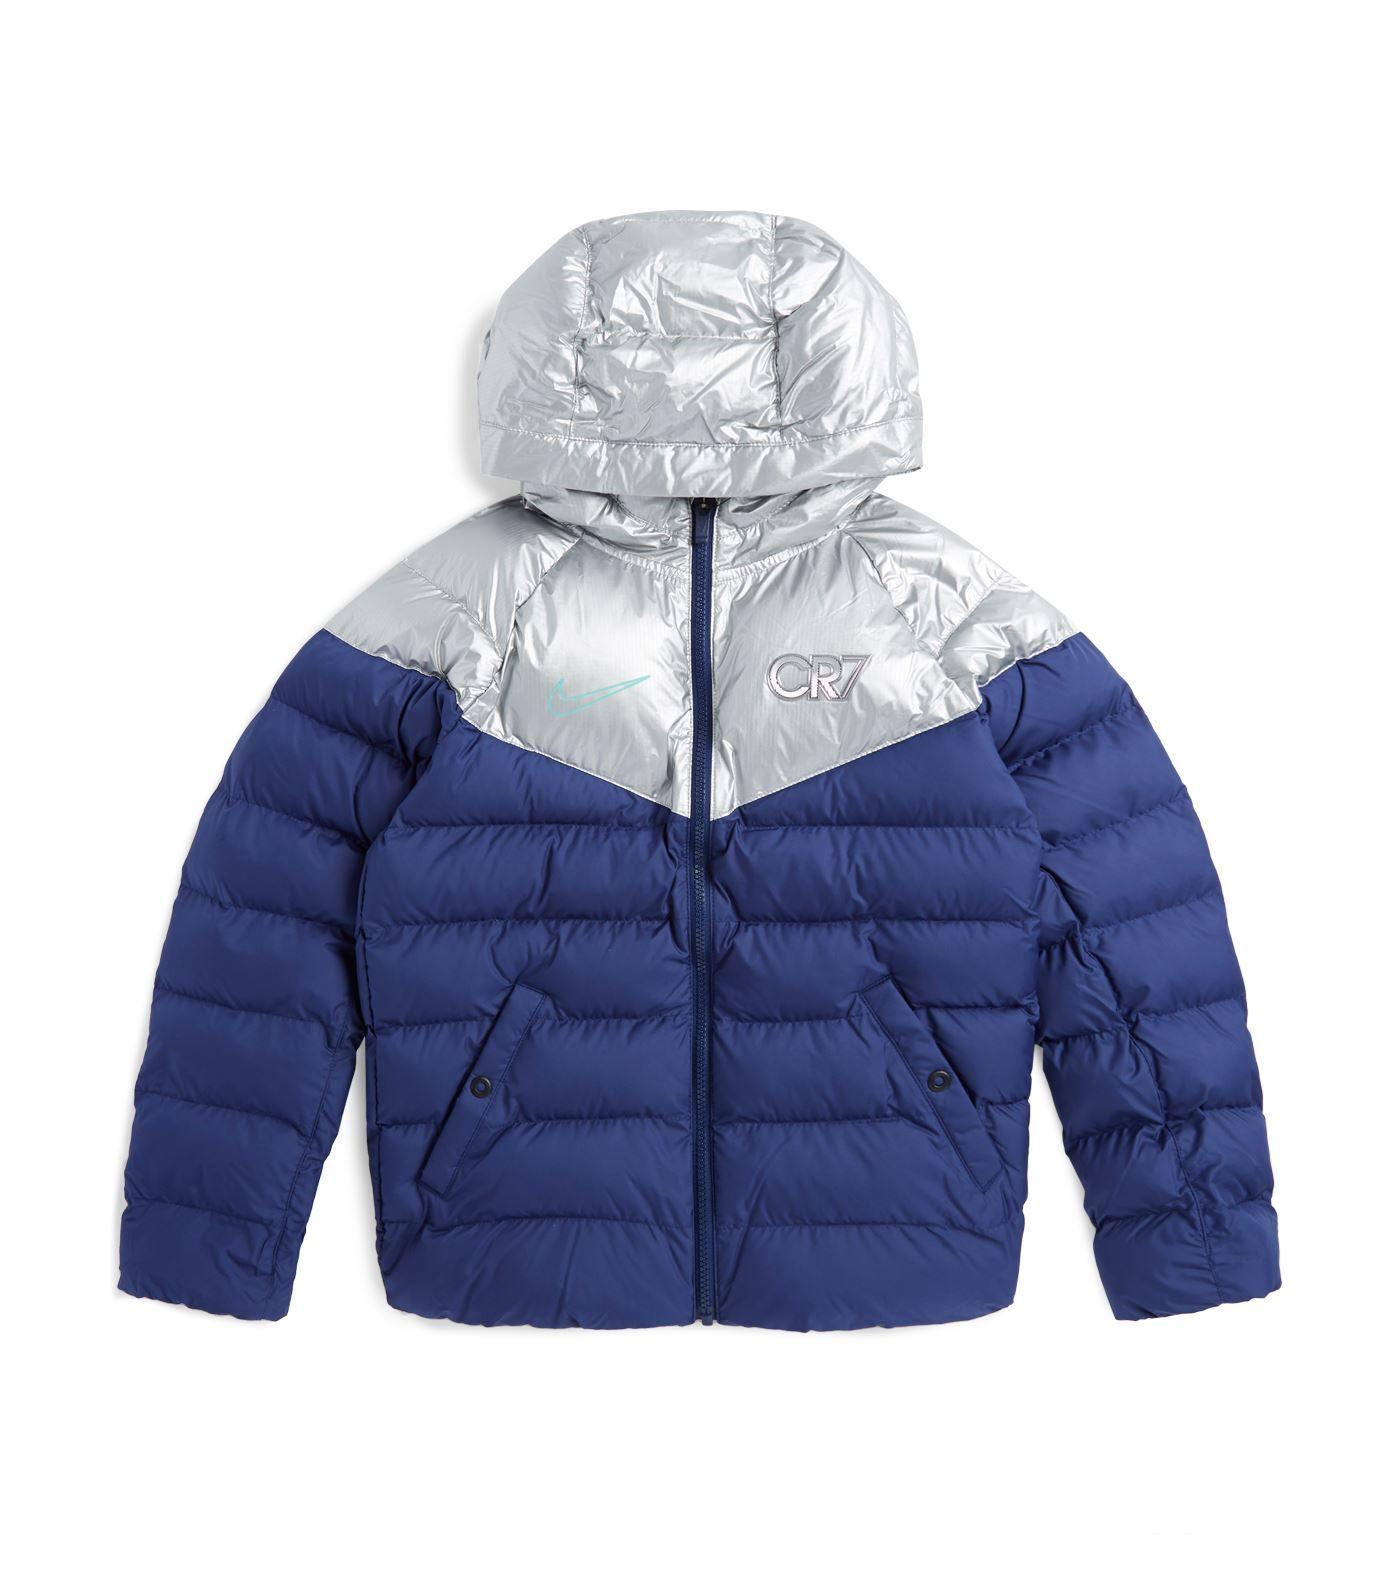 Nike Cr7 Hooded Puffer Jacket Nike Cloth Puffer Jackets Jackets Puffer [ 1592 x 1400 Pixel ]